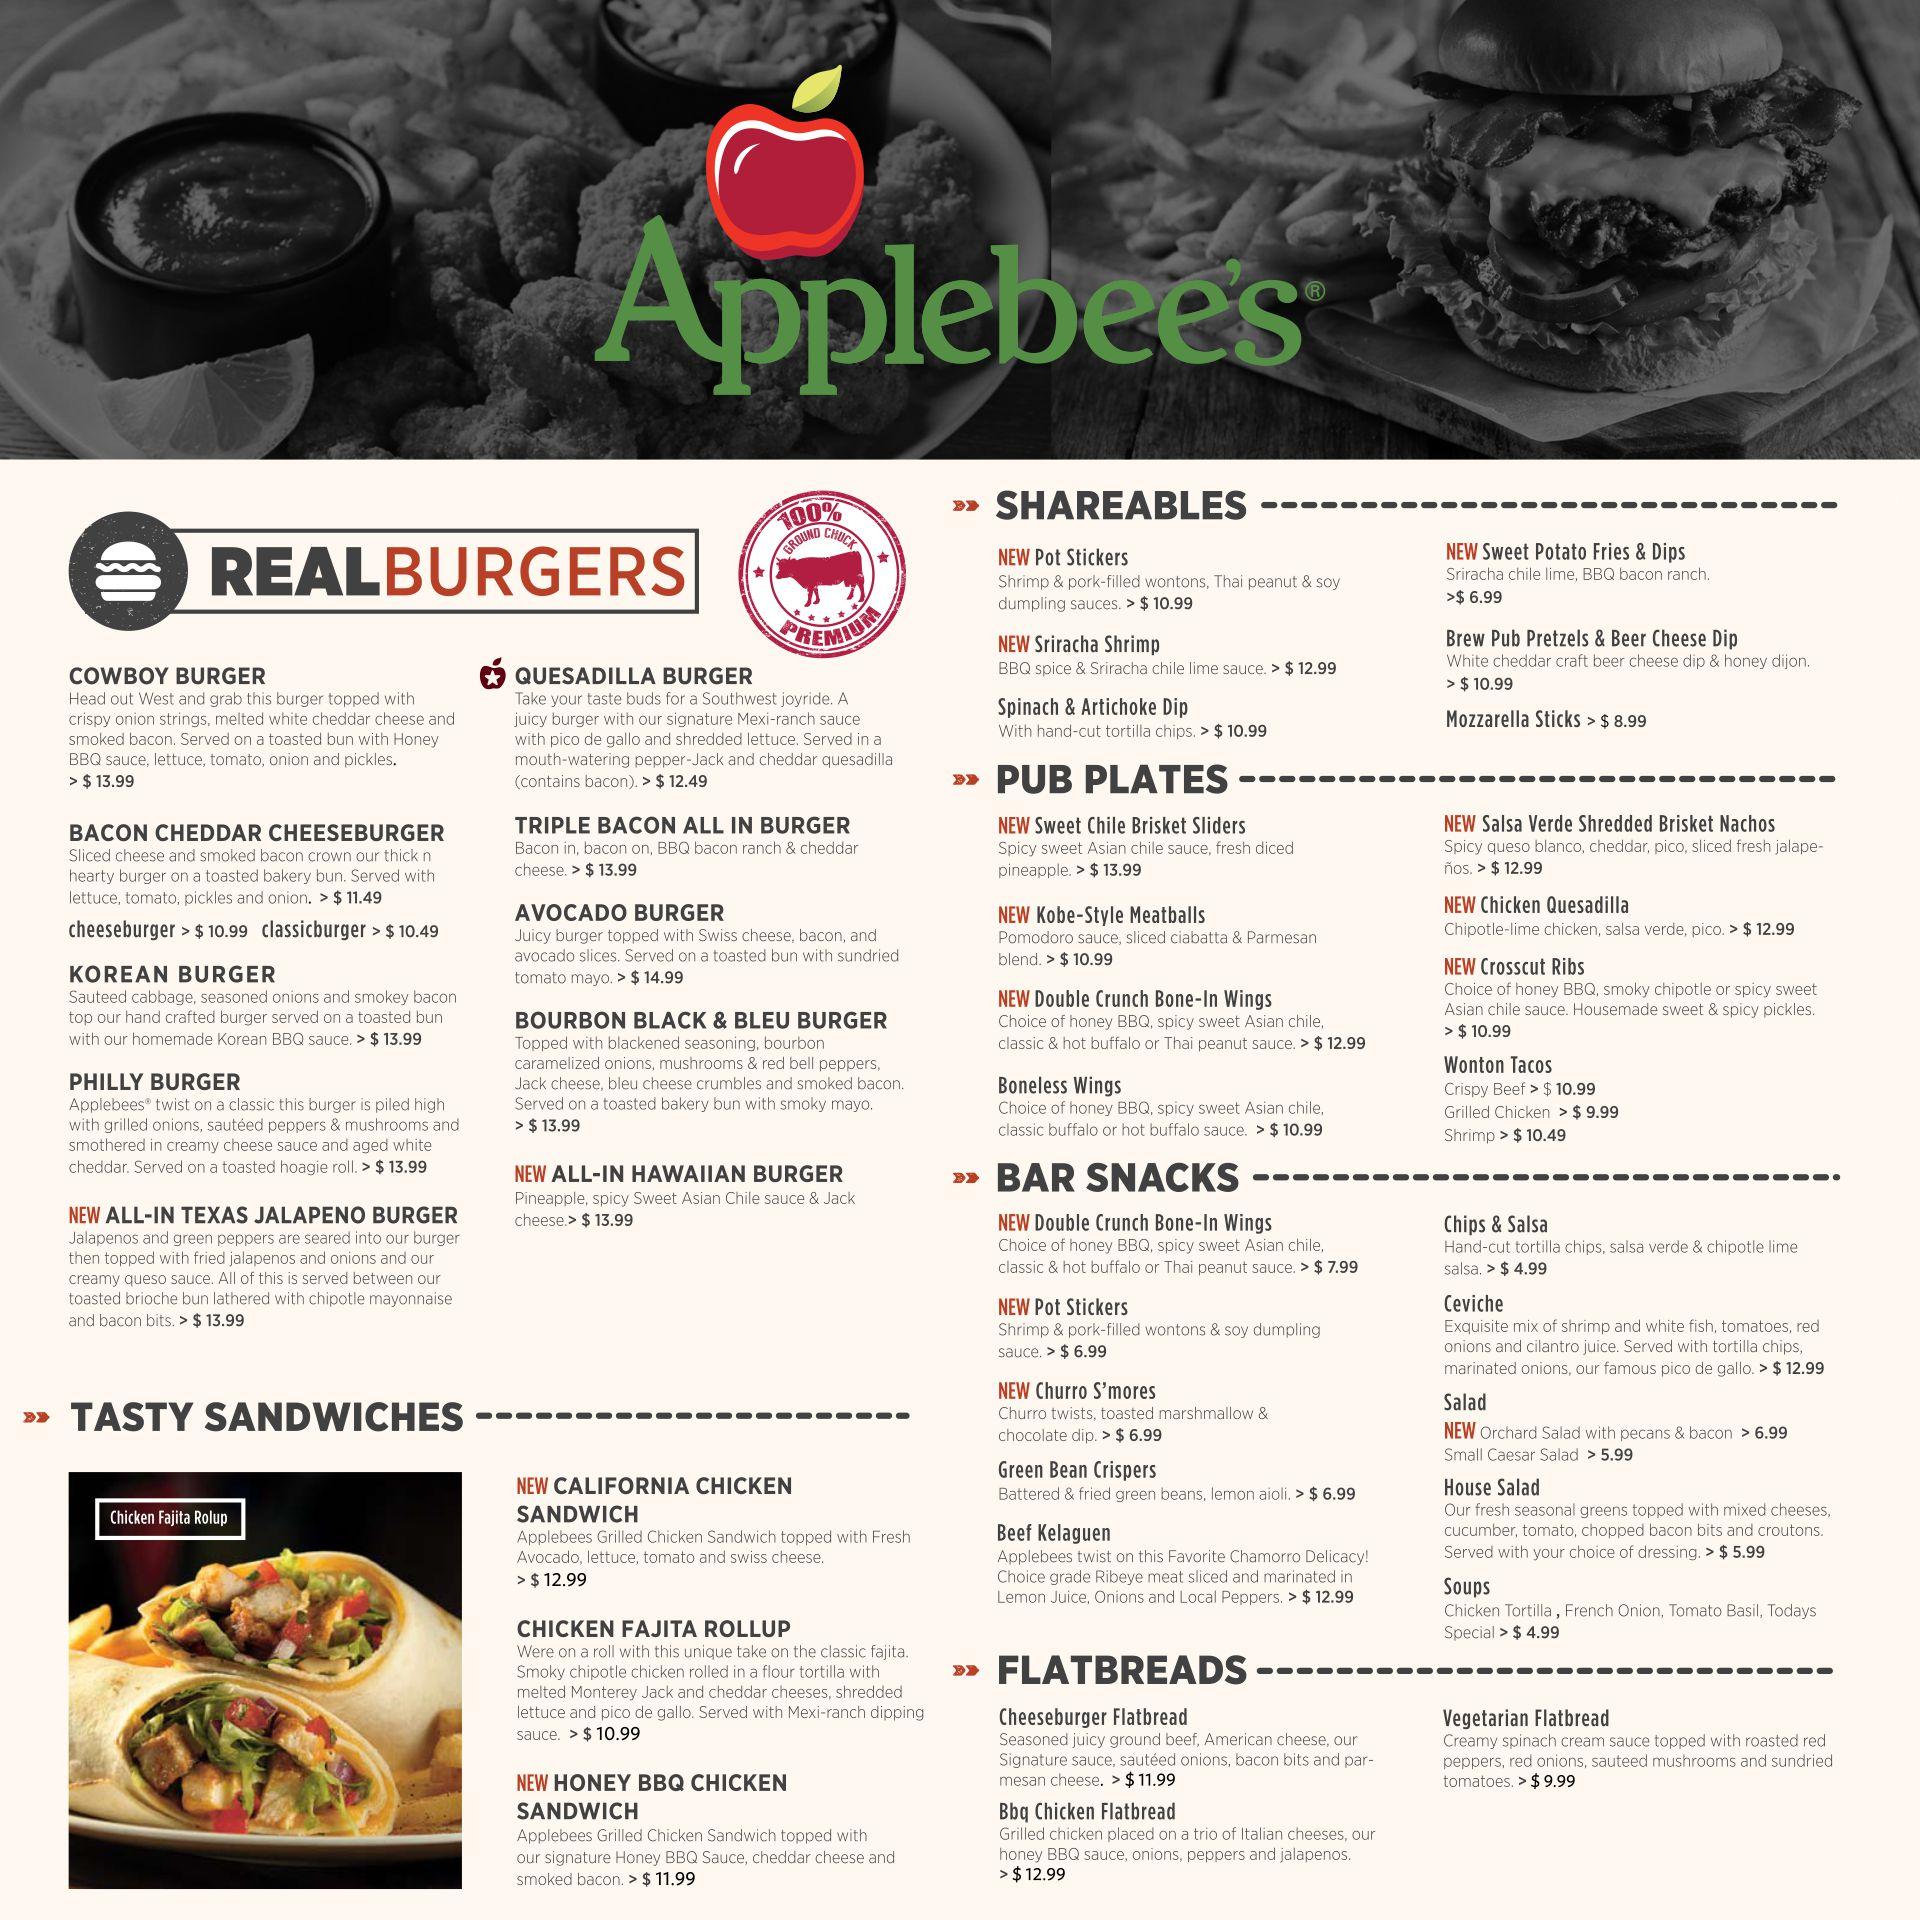 Applebees Printable Menu with Prices